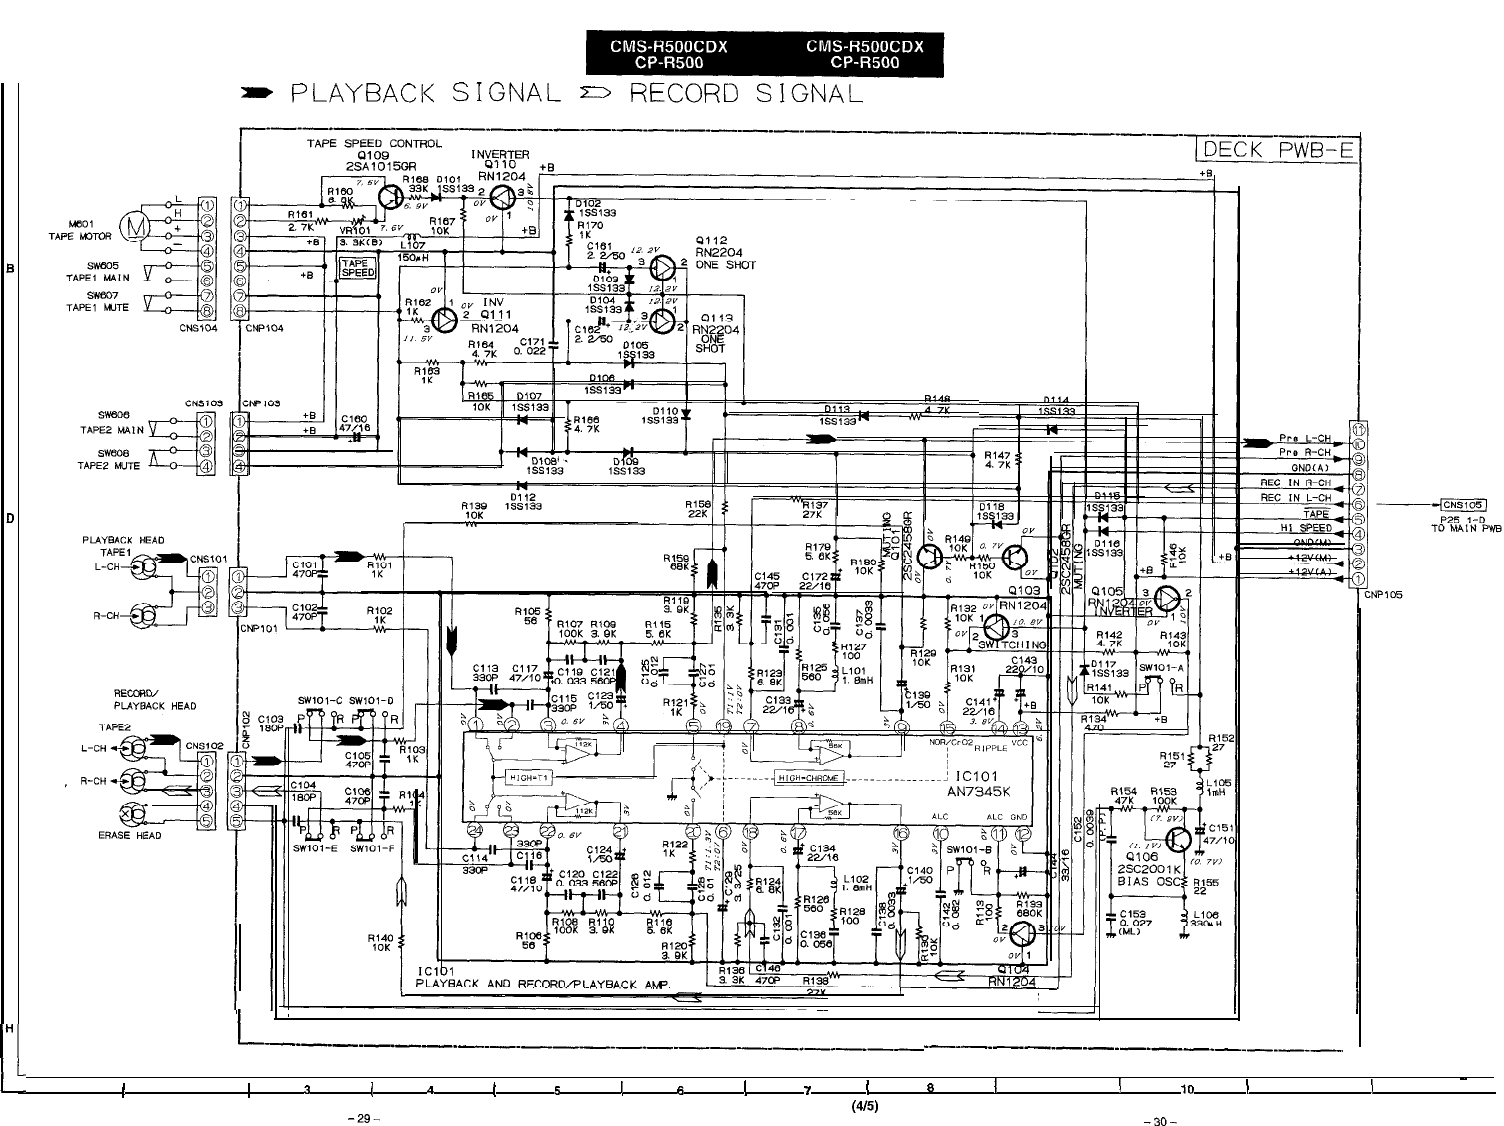 CMSR500